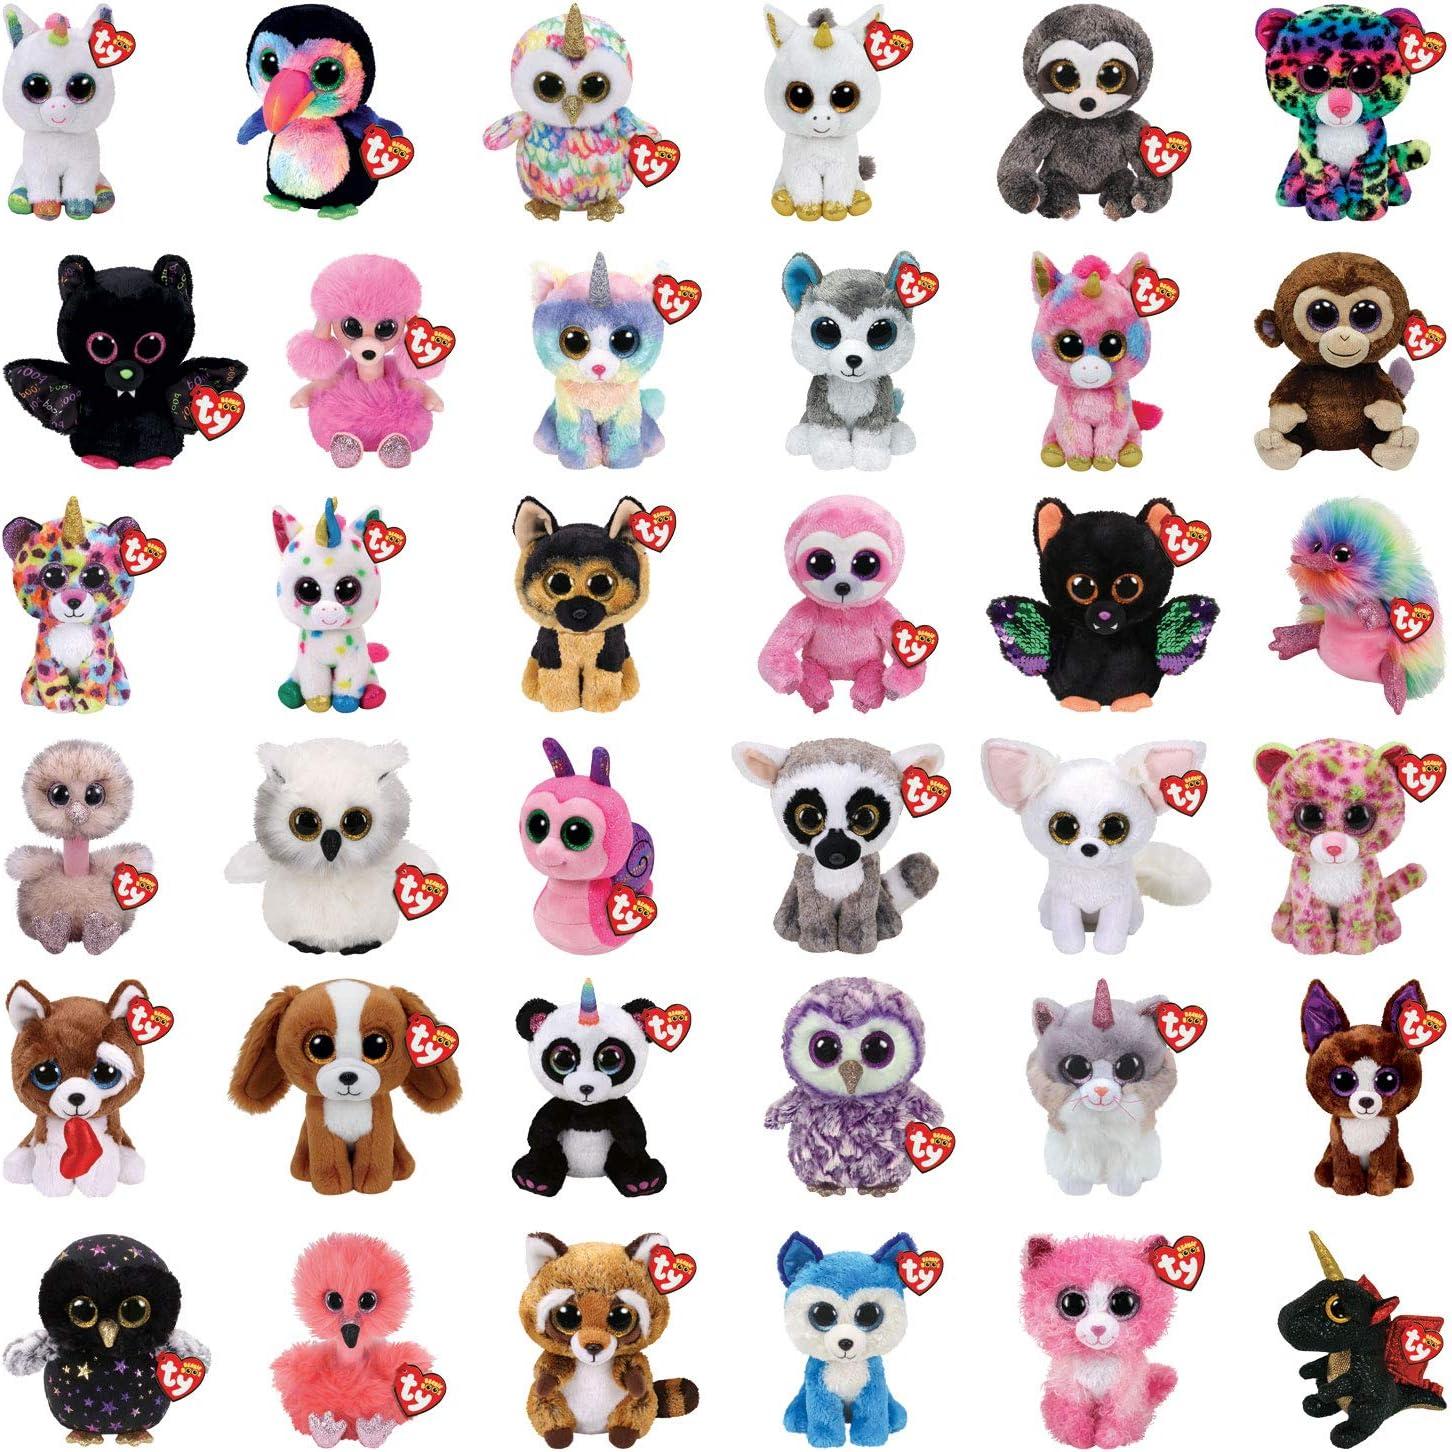 Random 5 Pack No Duplicates Plush Soft Toy TY Beanie Boo Boos